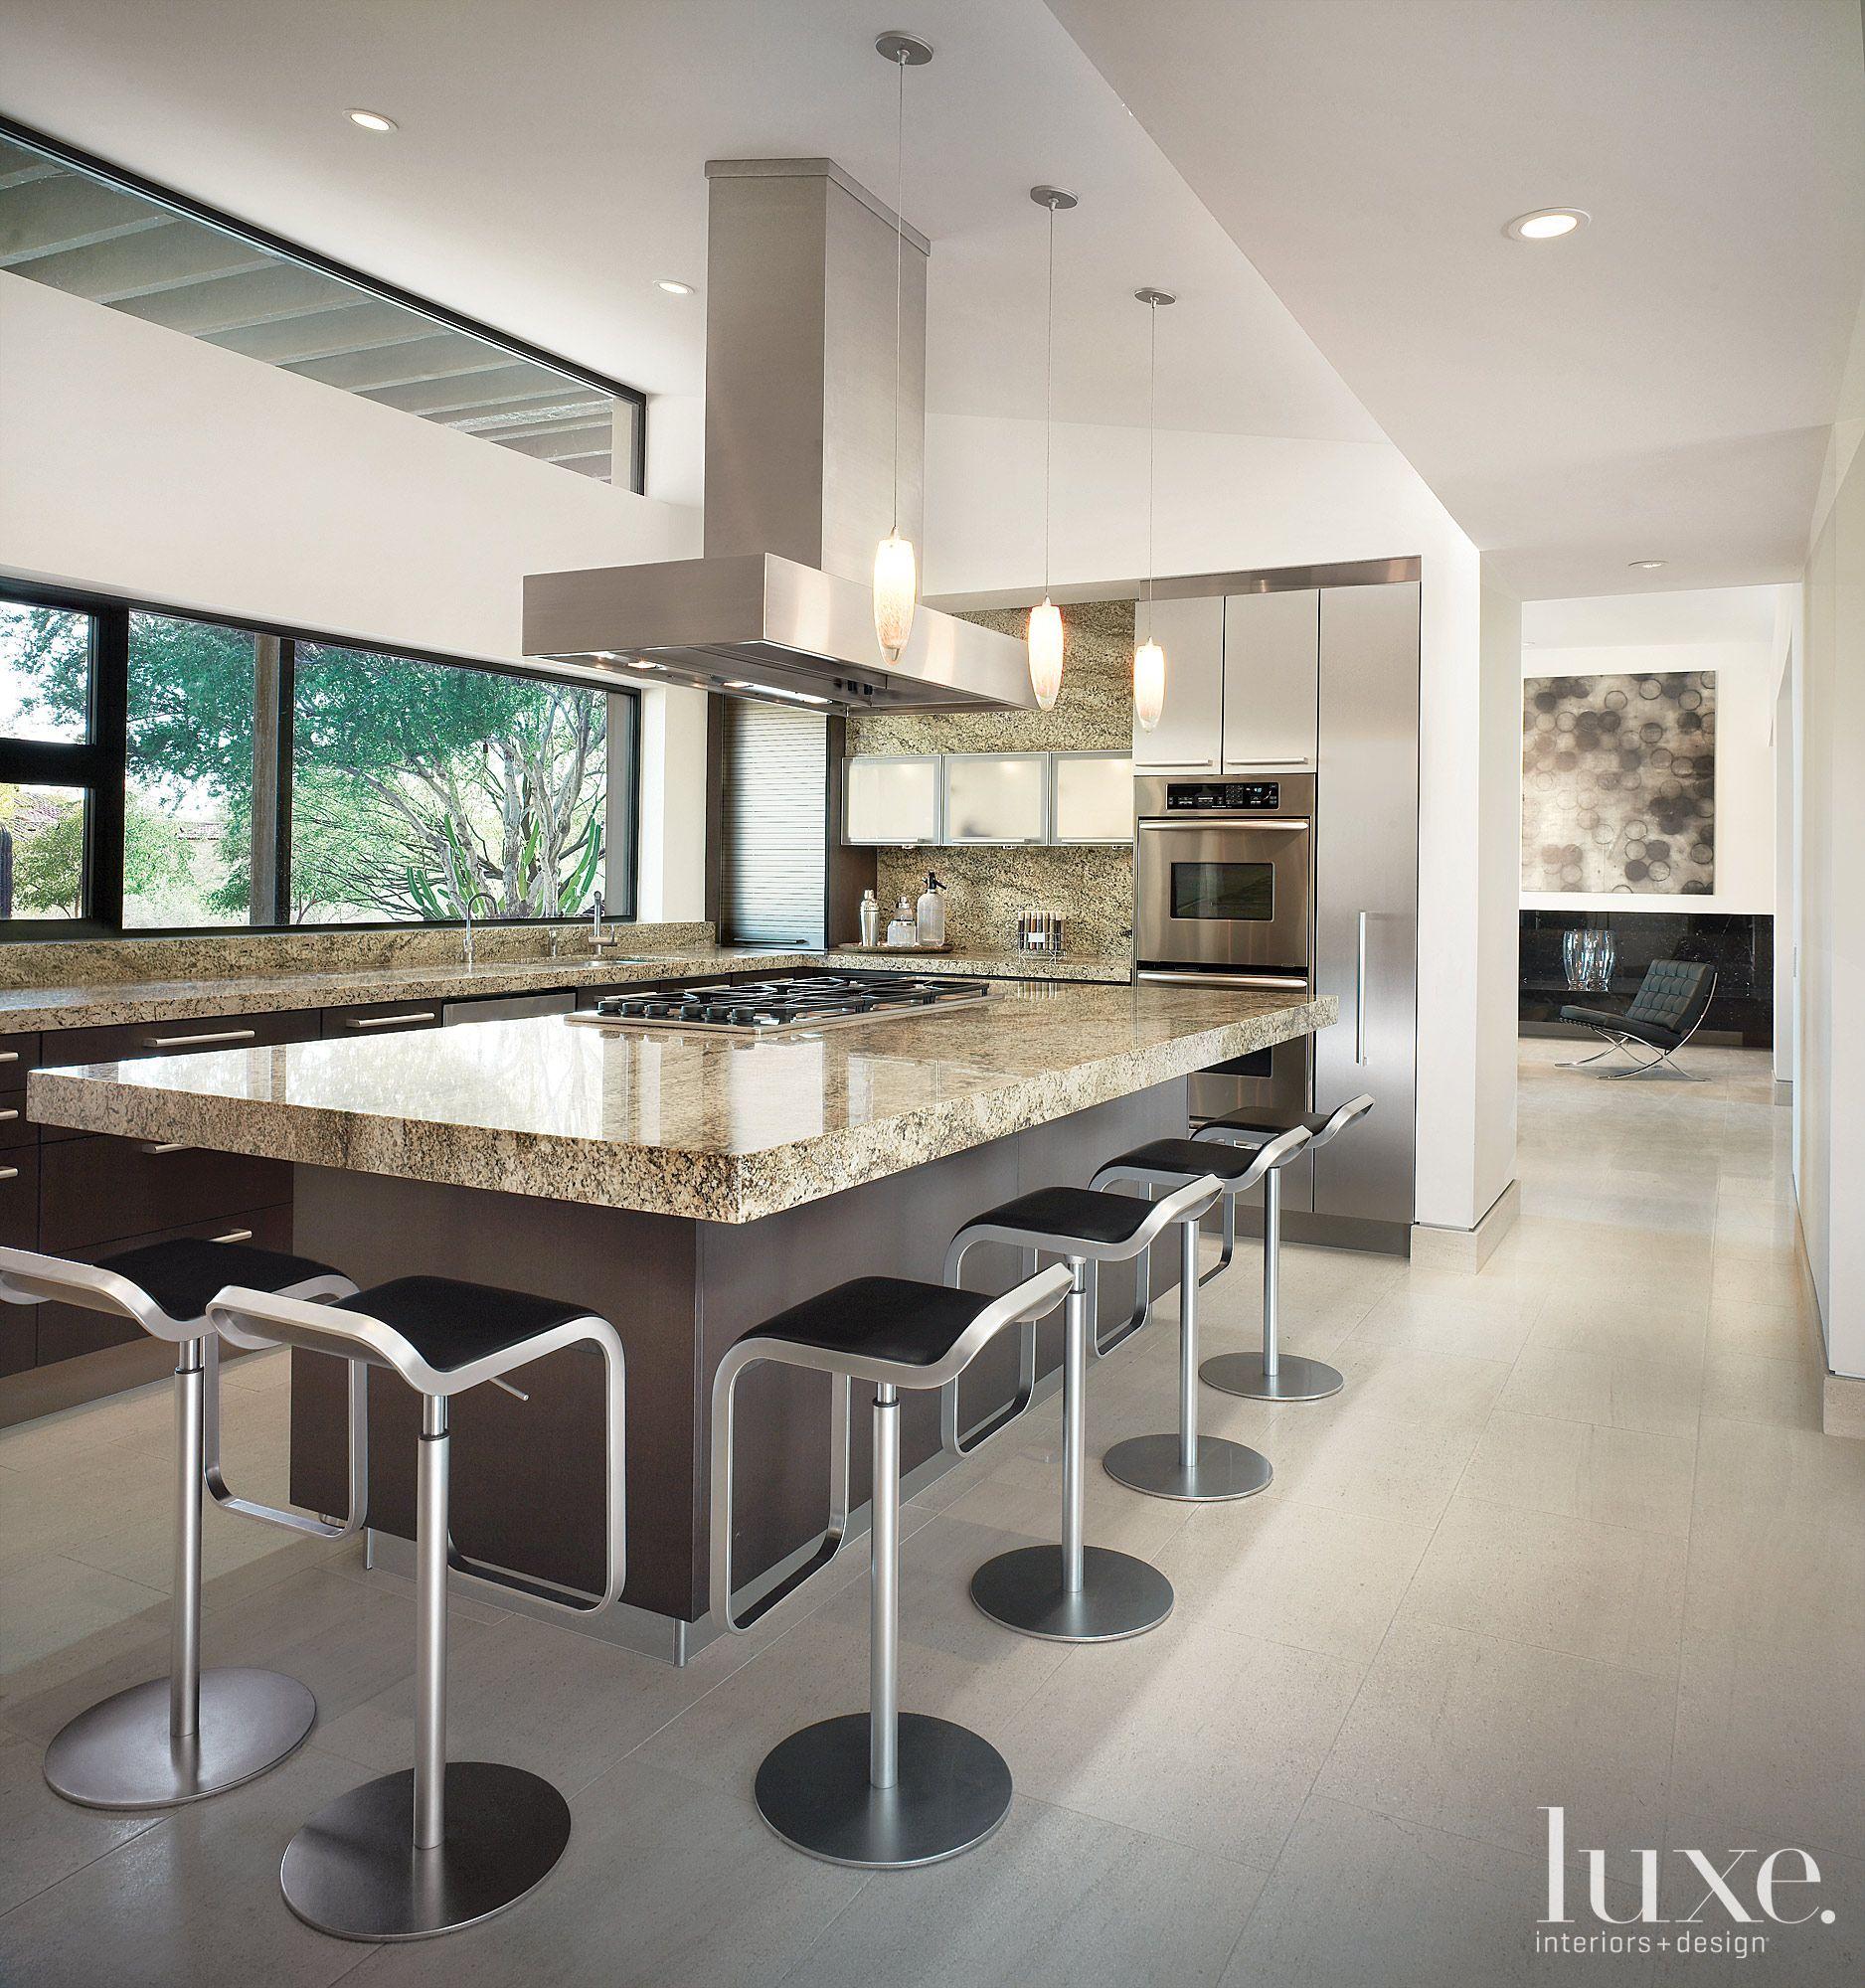 pinluxe interiors  design magazine on luxe  kitchens